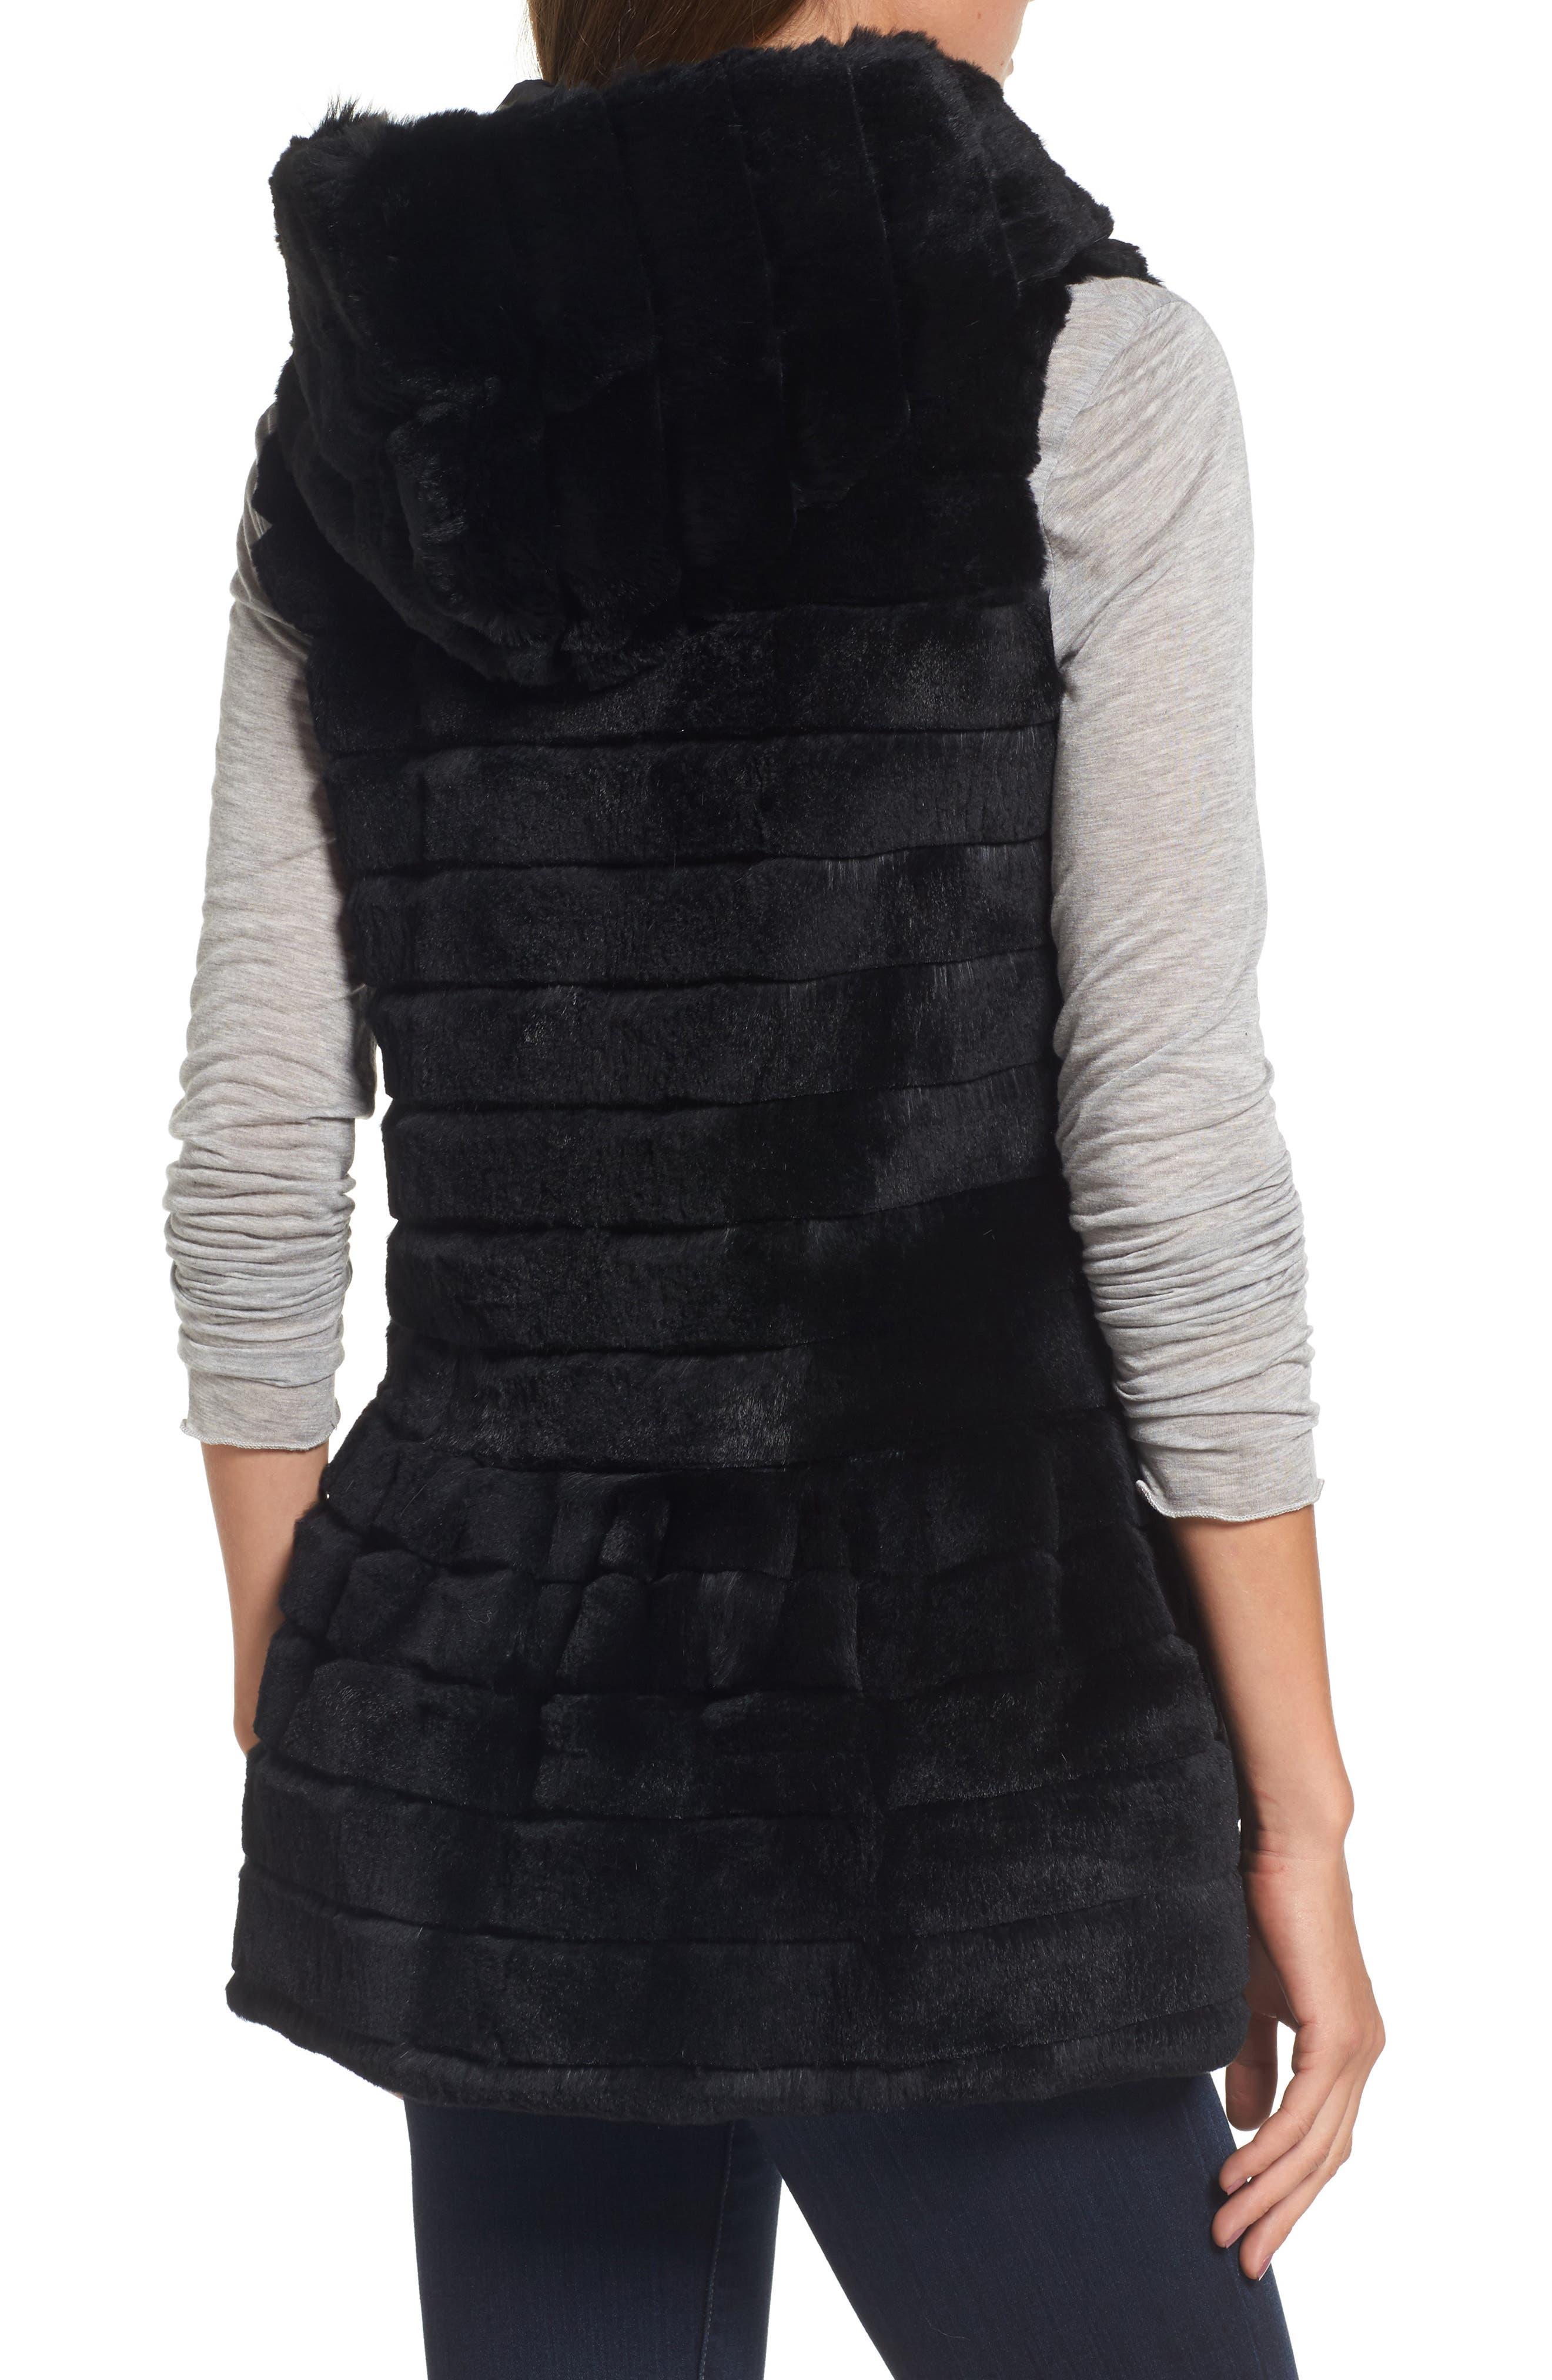 Genuine Rabbit Fur Hooded Vest,                             Alternate thumbnail 2, color,                             001